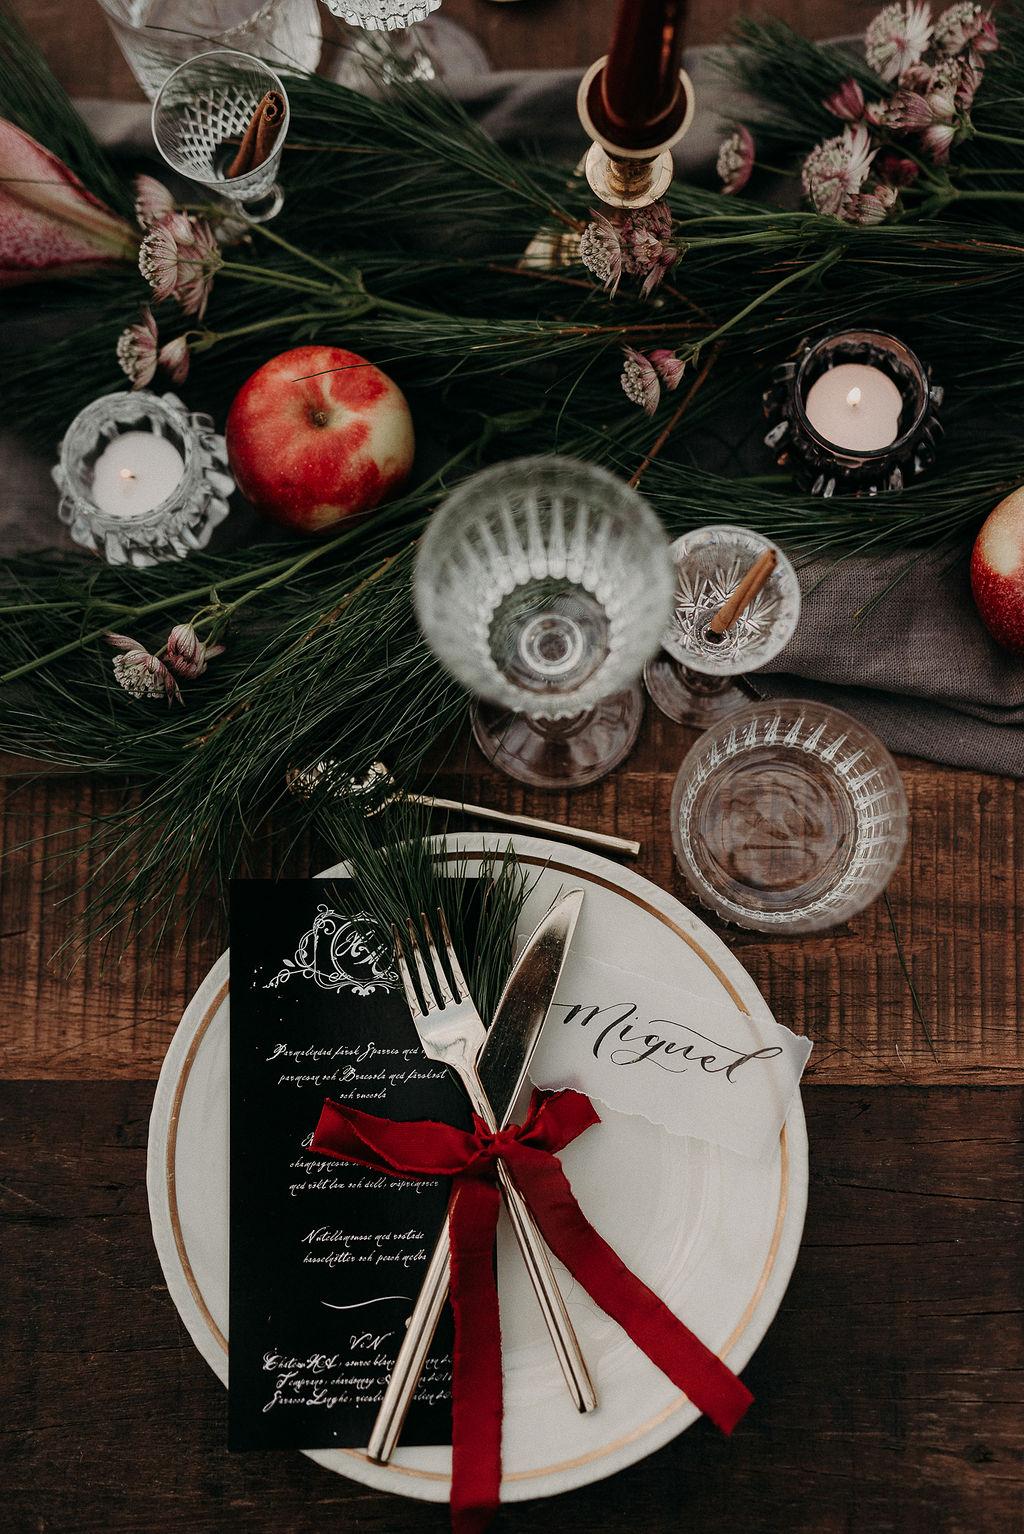 Julbröllop+vinterbröllop+dukning4.jpg